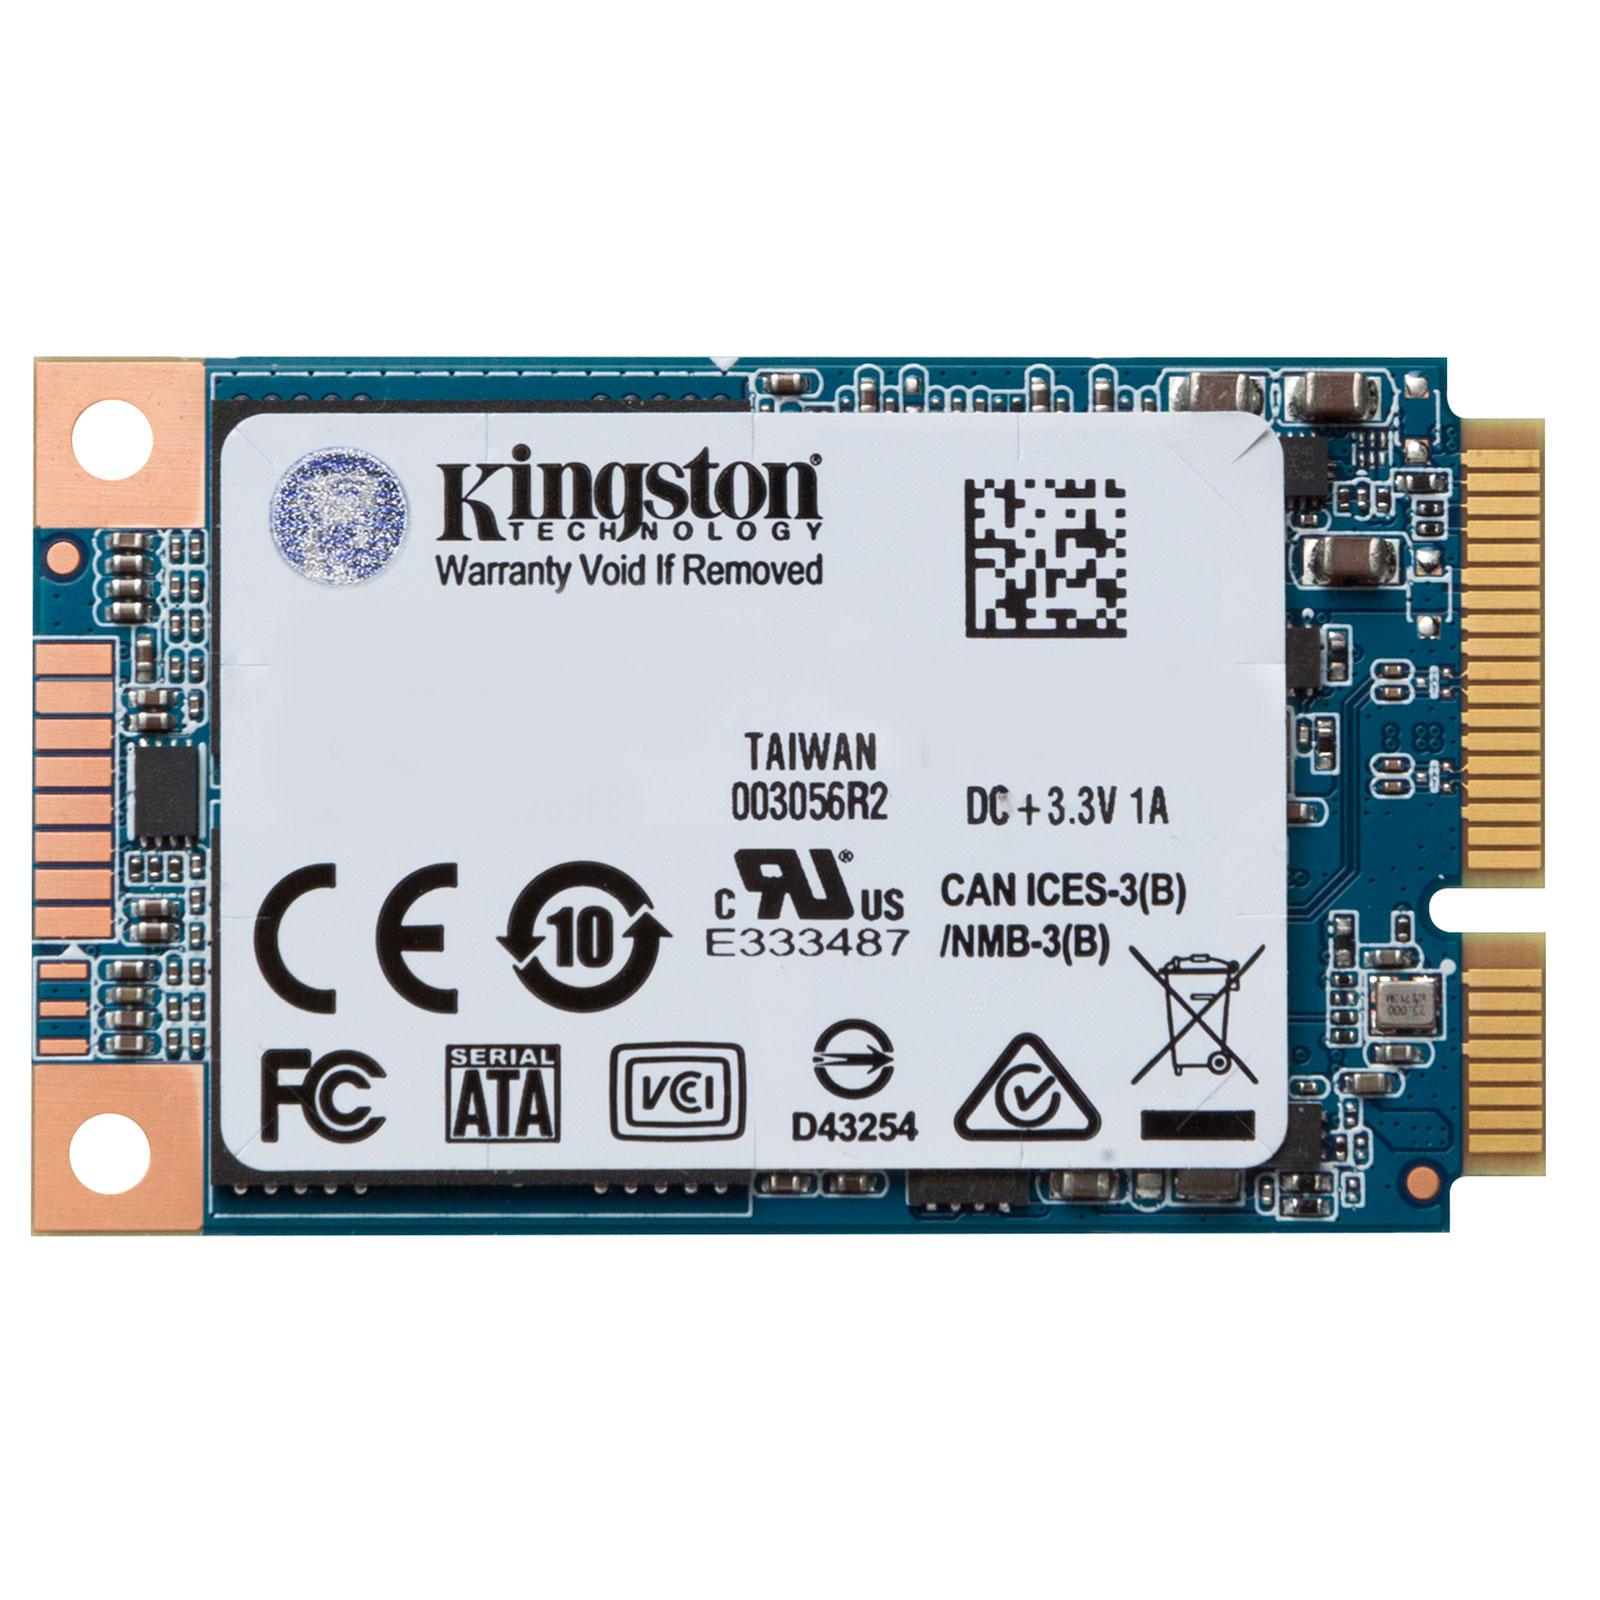 Kingston SUV500MS/120G 120-128Go mSATA - Disque SSD Kingston - 2